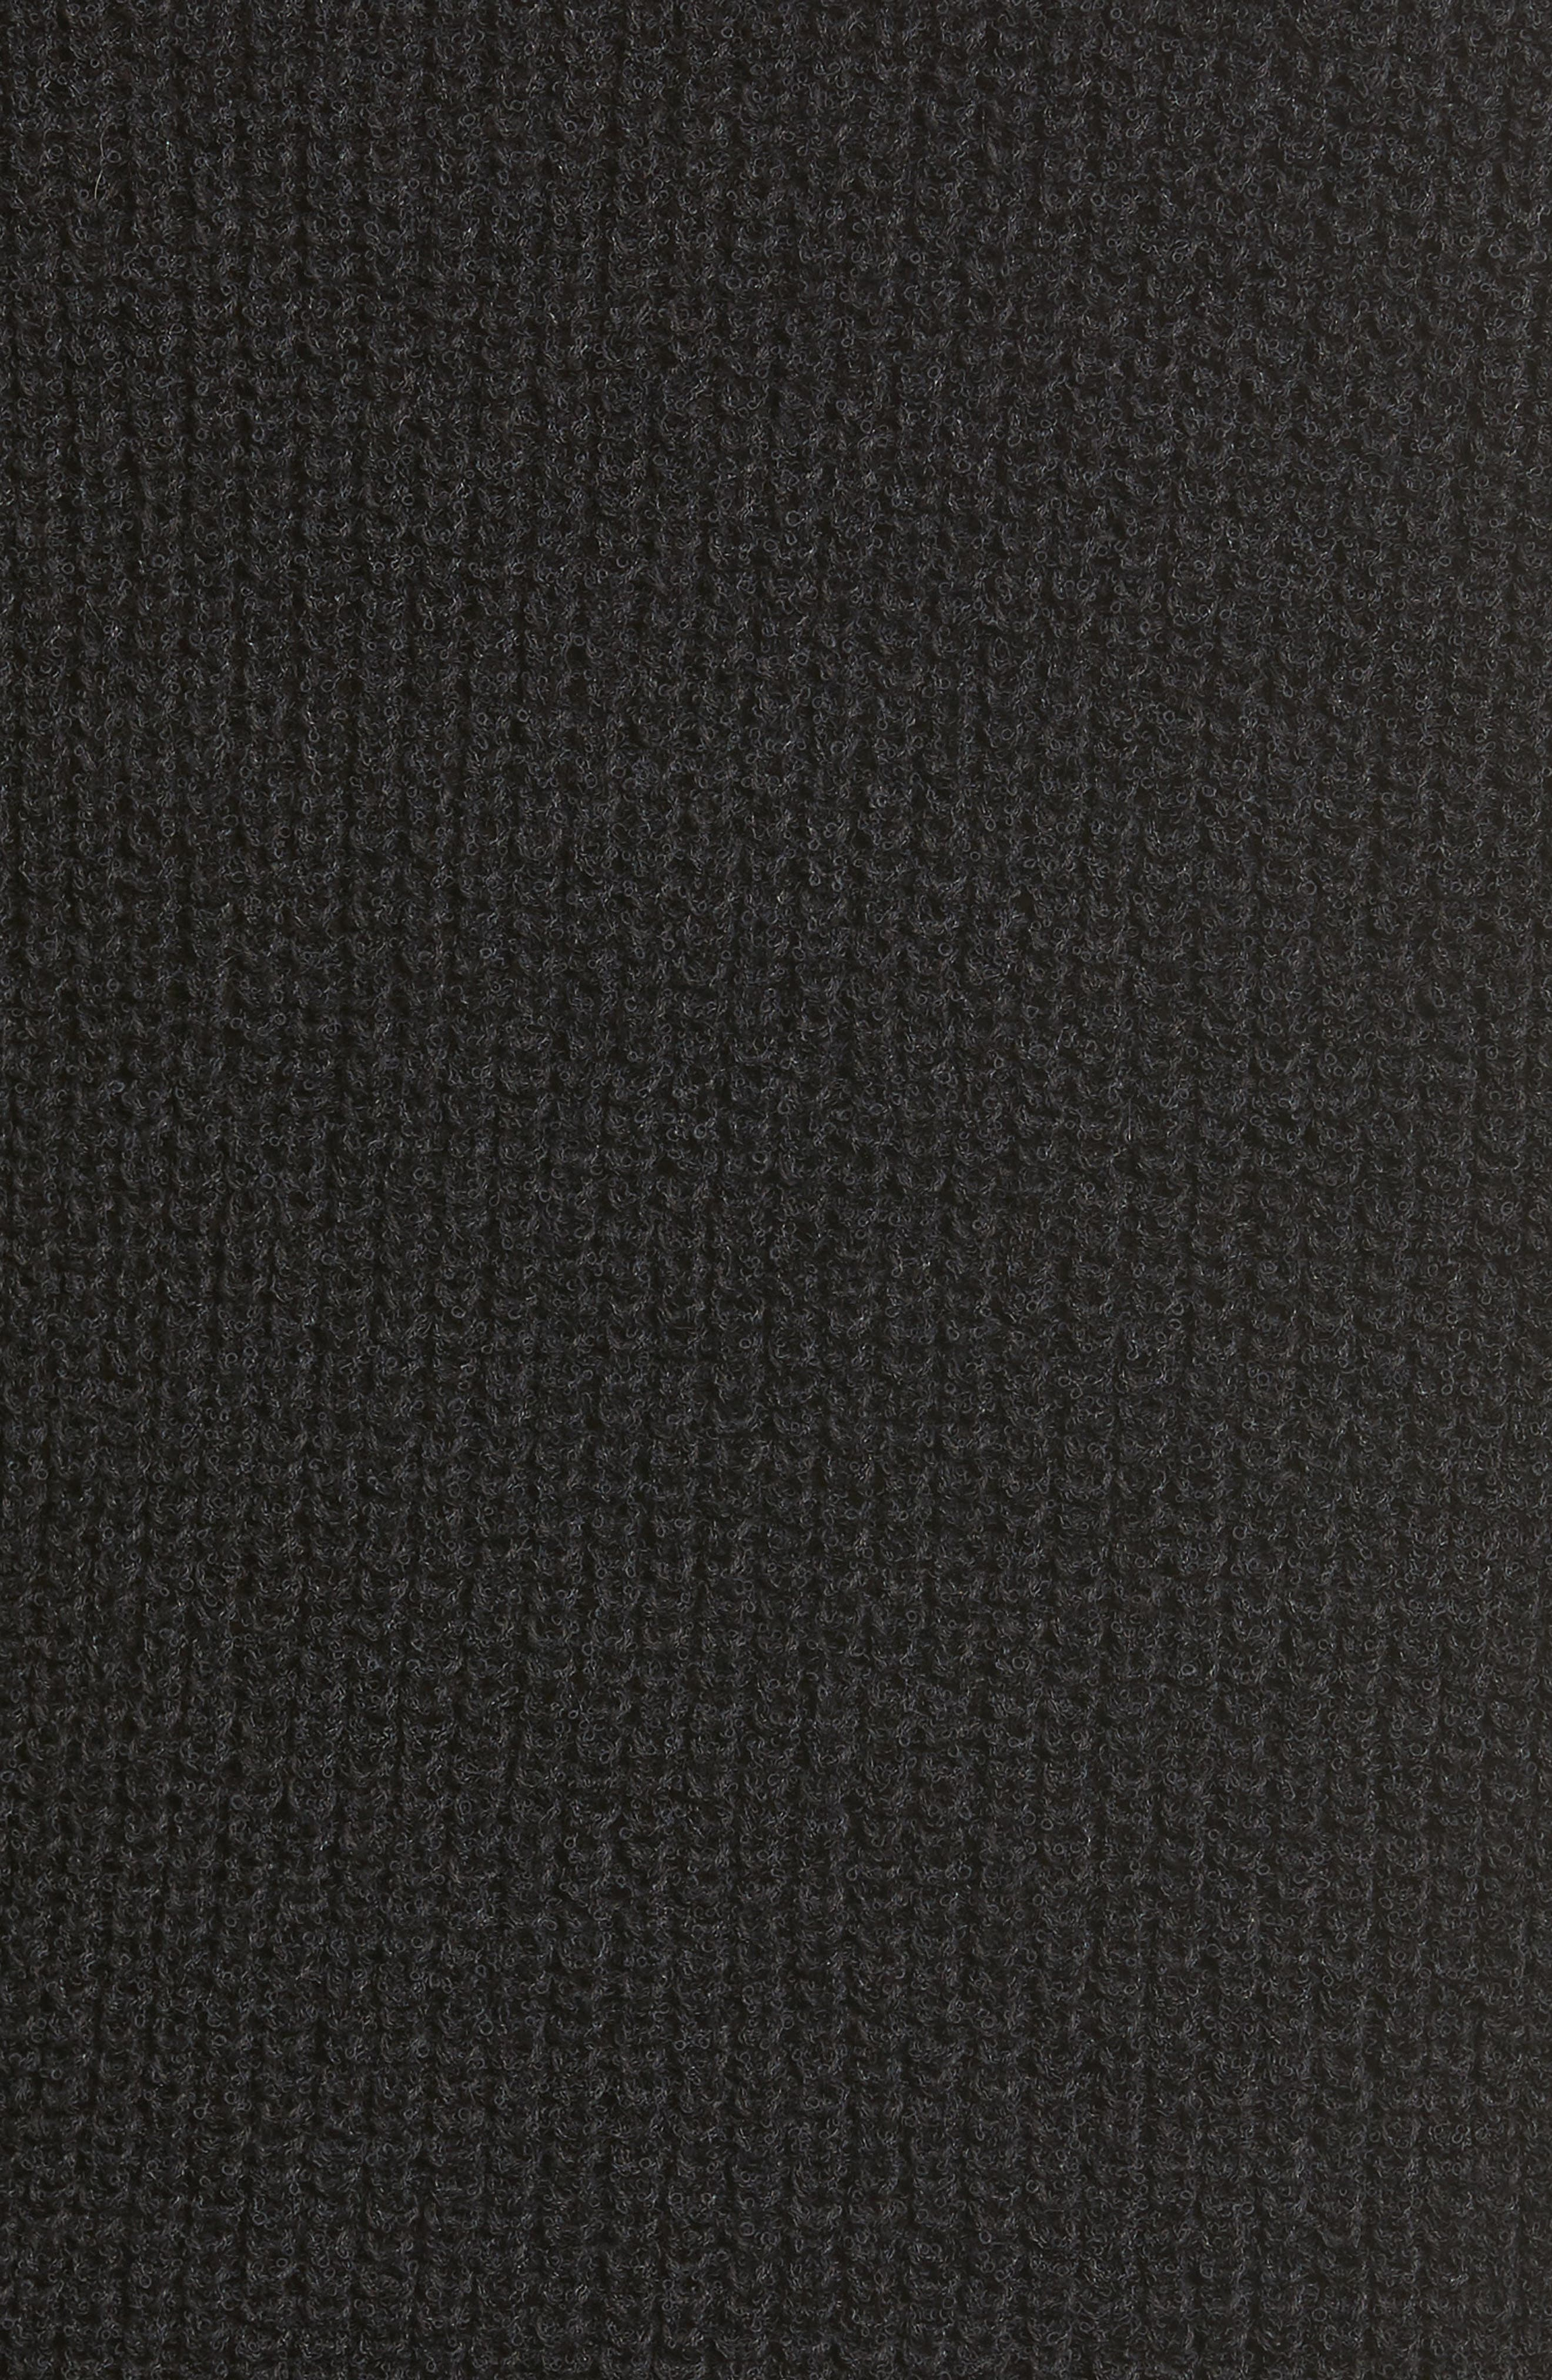 Dawn Sweater,                             Alternate thumbnail 5, color,                             Black